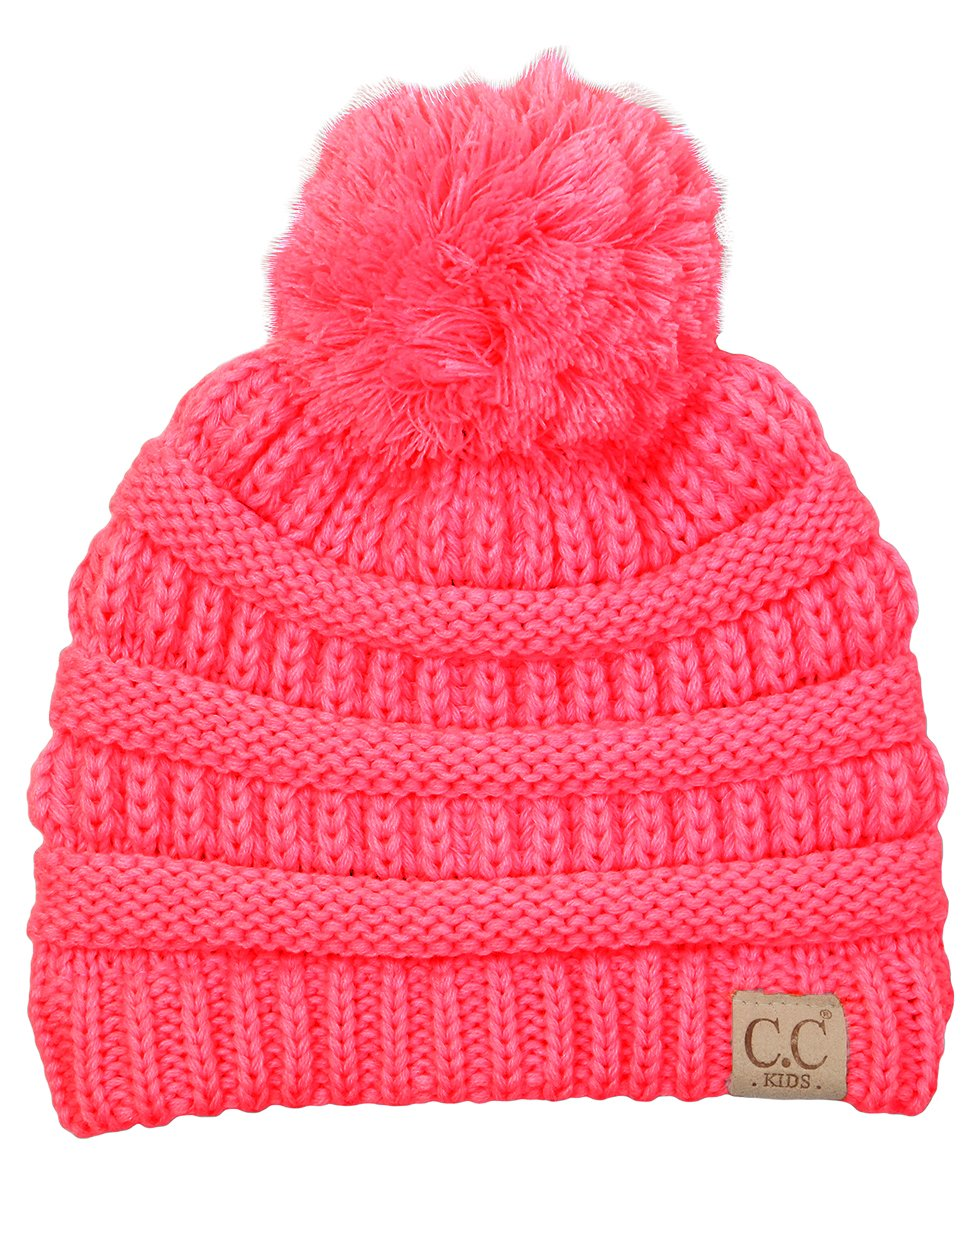 H-6847-37 Girls Winter Hat Warm Knit Slouchy Toddler Kid Pom Beanie - Candy Pink